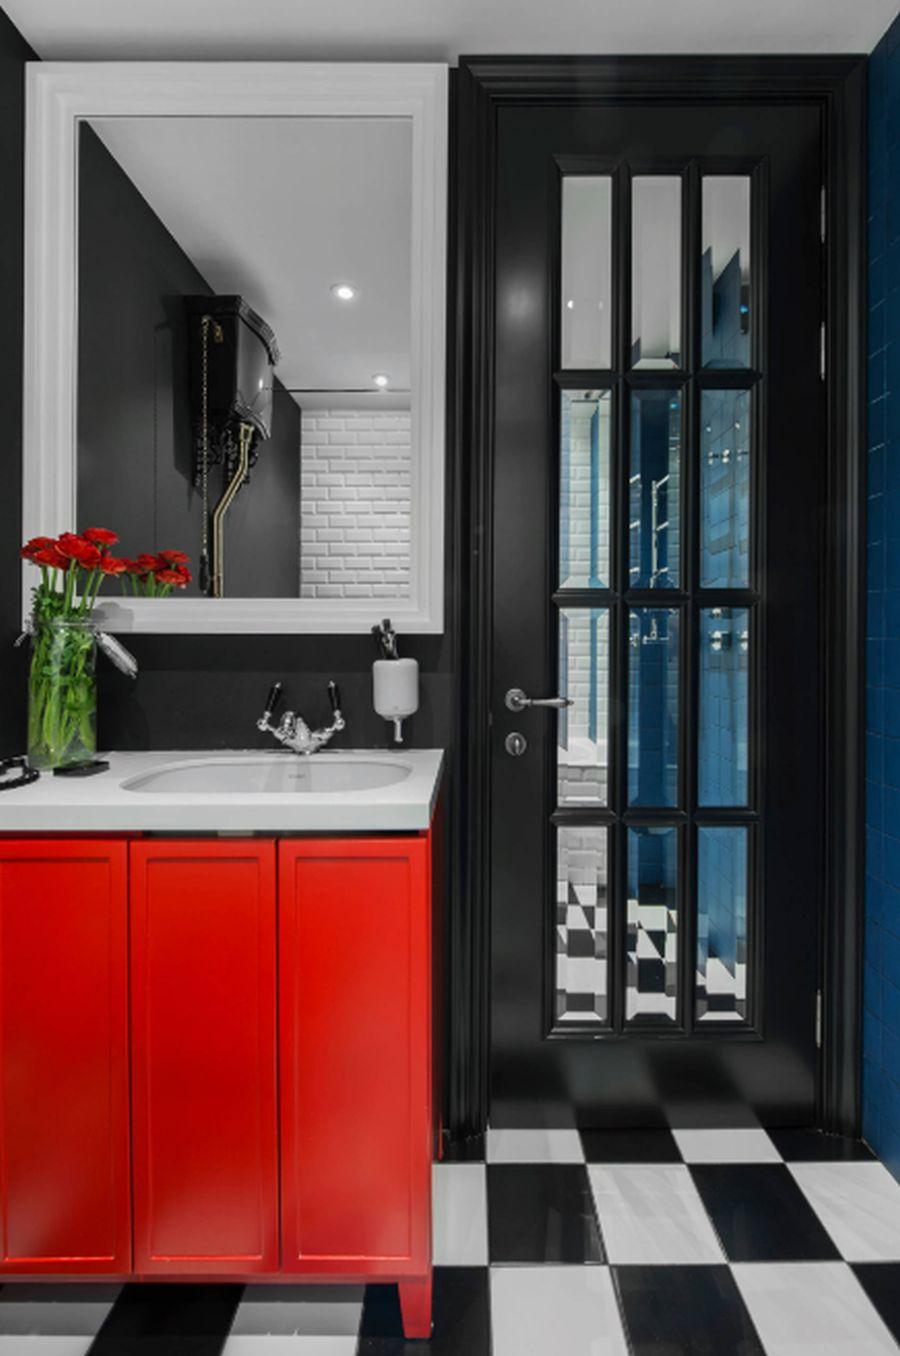 adelaparvu-com-despre-reoganizarea-unui-apartament-de-2-camere-in-3-camere-54-mp-designer-masha-kunyakina-foto-olga-melekesceva-11